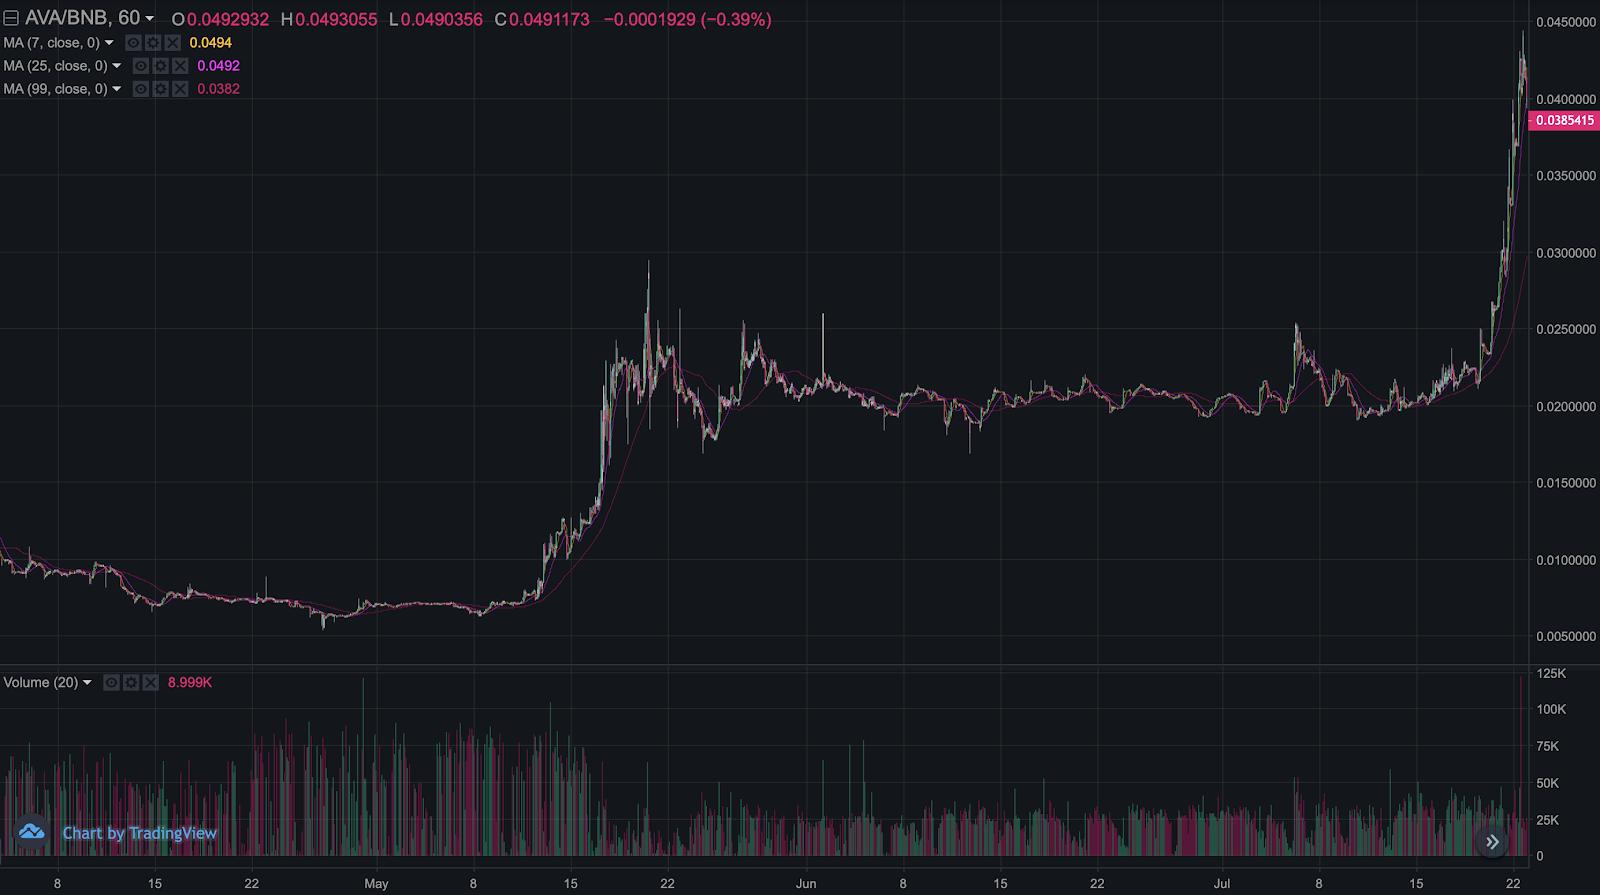 AVA/BNB chart on Binance DEX